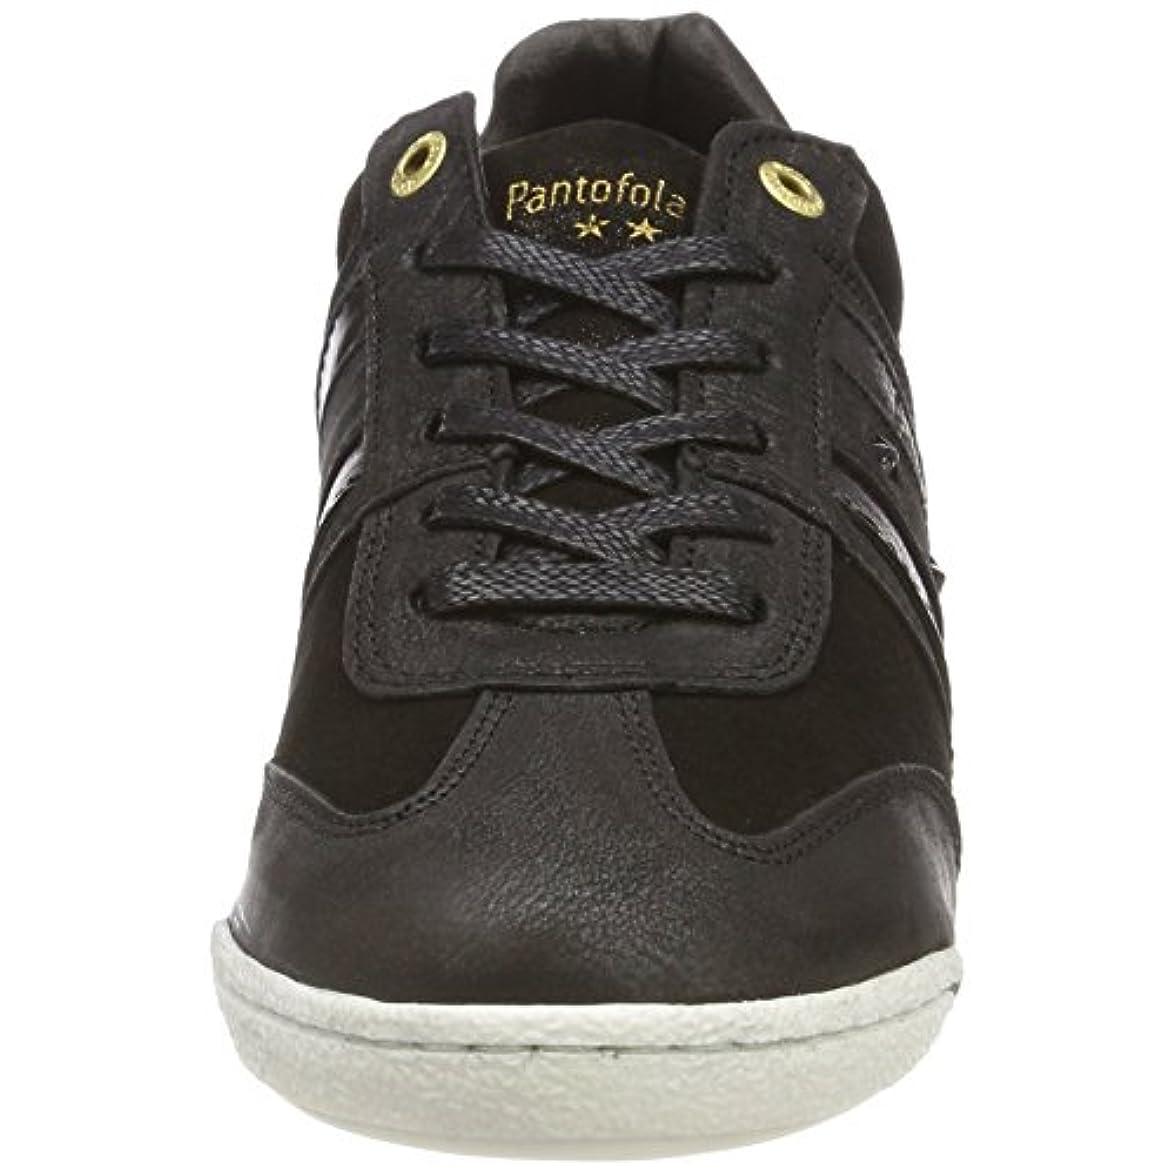 Pantofola D'oro Imola Glitter Donne Low Sneaker Donna